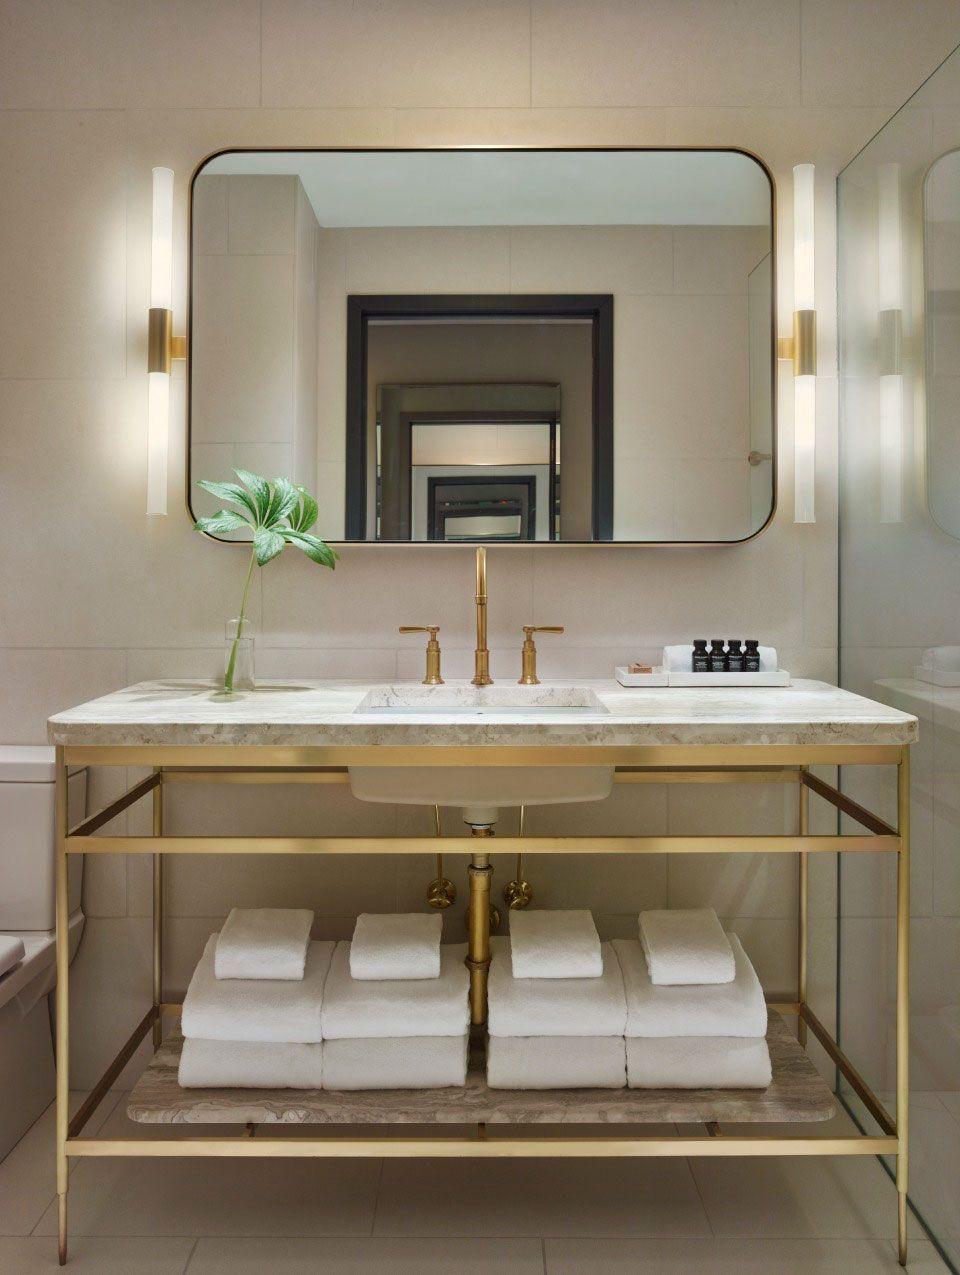 11 Howard A Scandi Paradise In Soho New York Hotel Bathroom